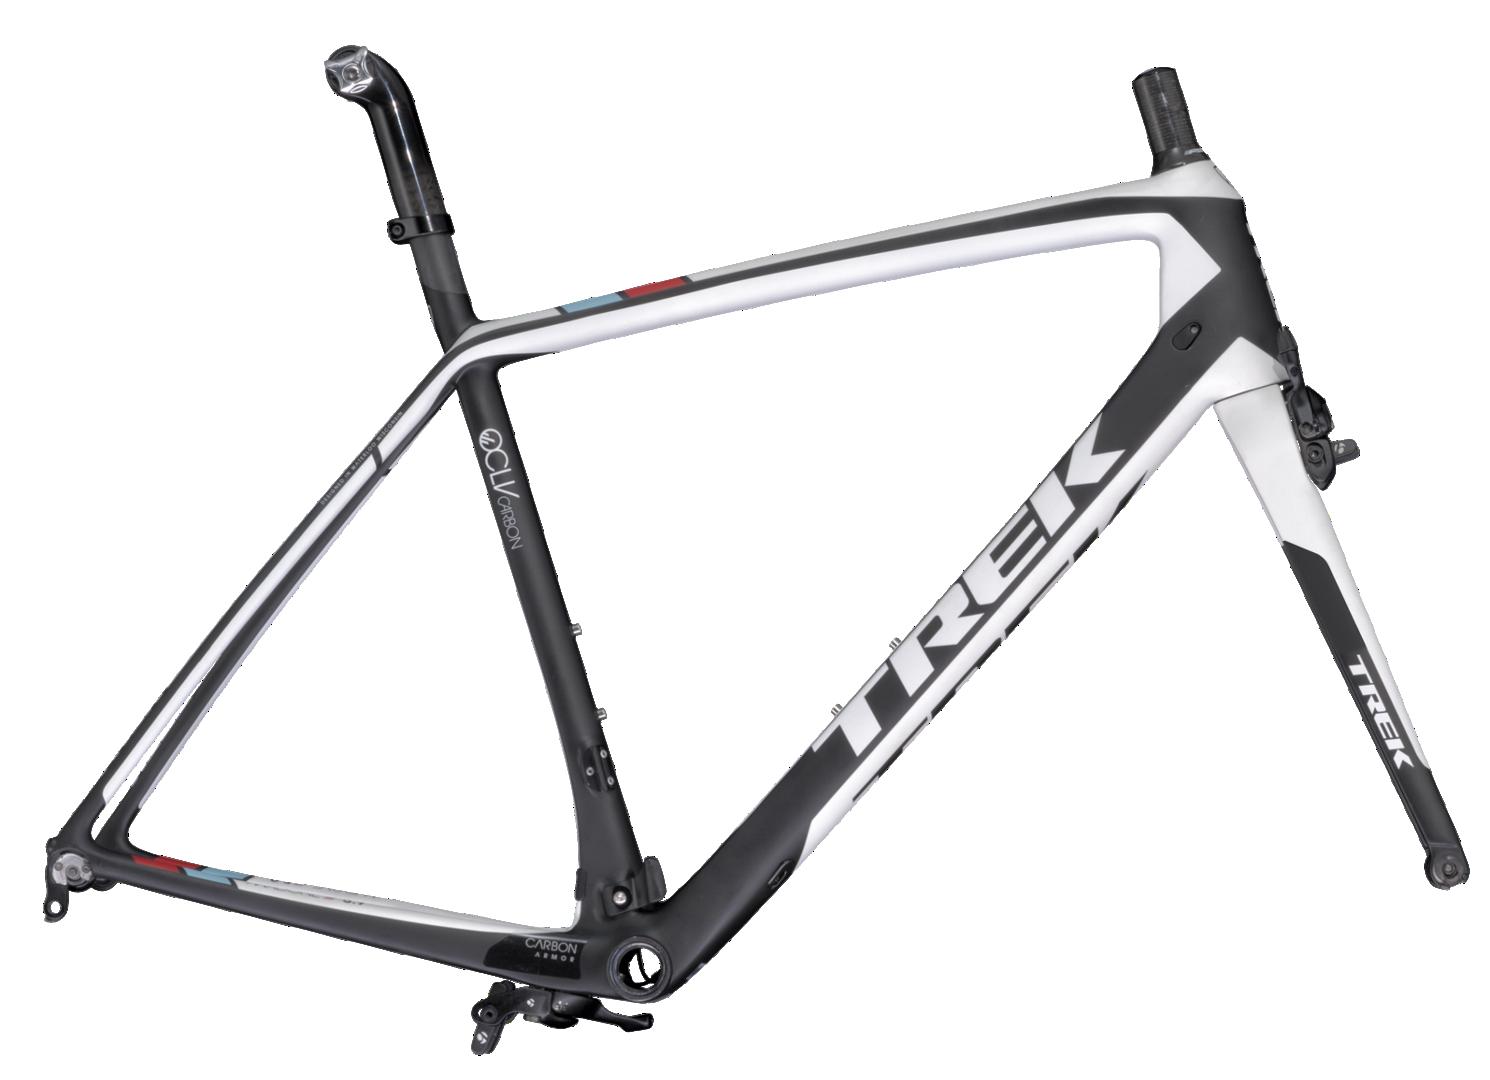 2013 Madone 5 Series H2 Frameset - Bike Archive - Trek Bicycle